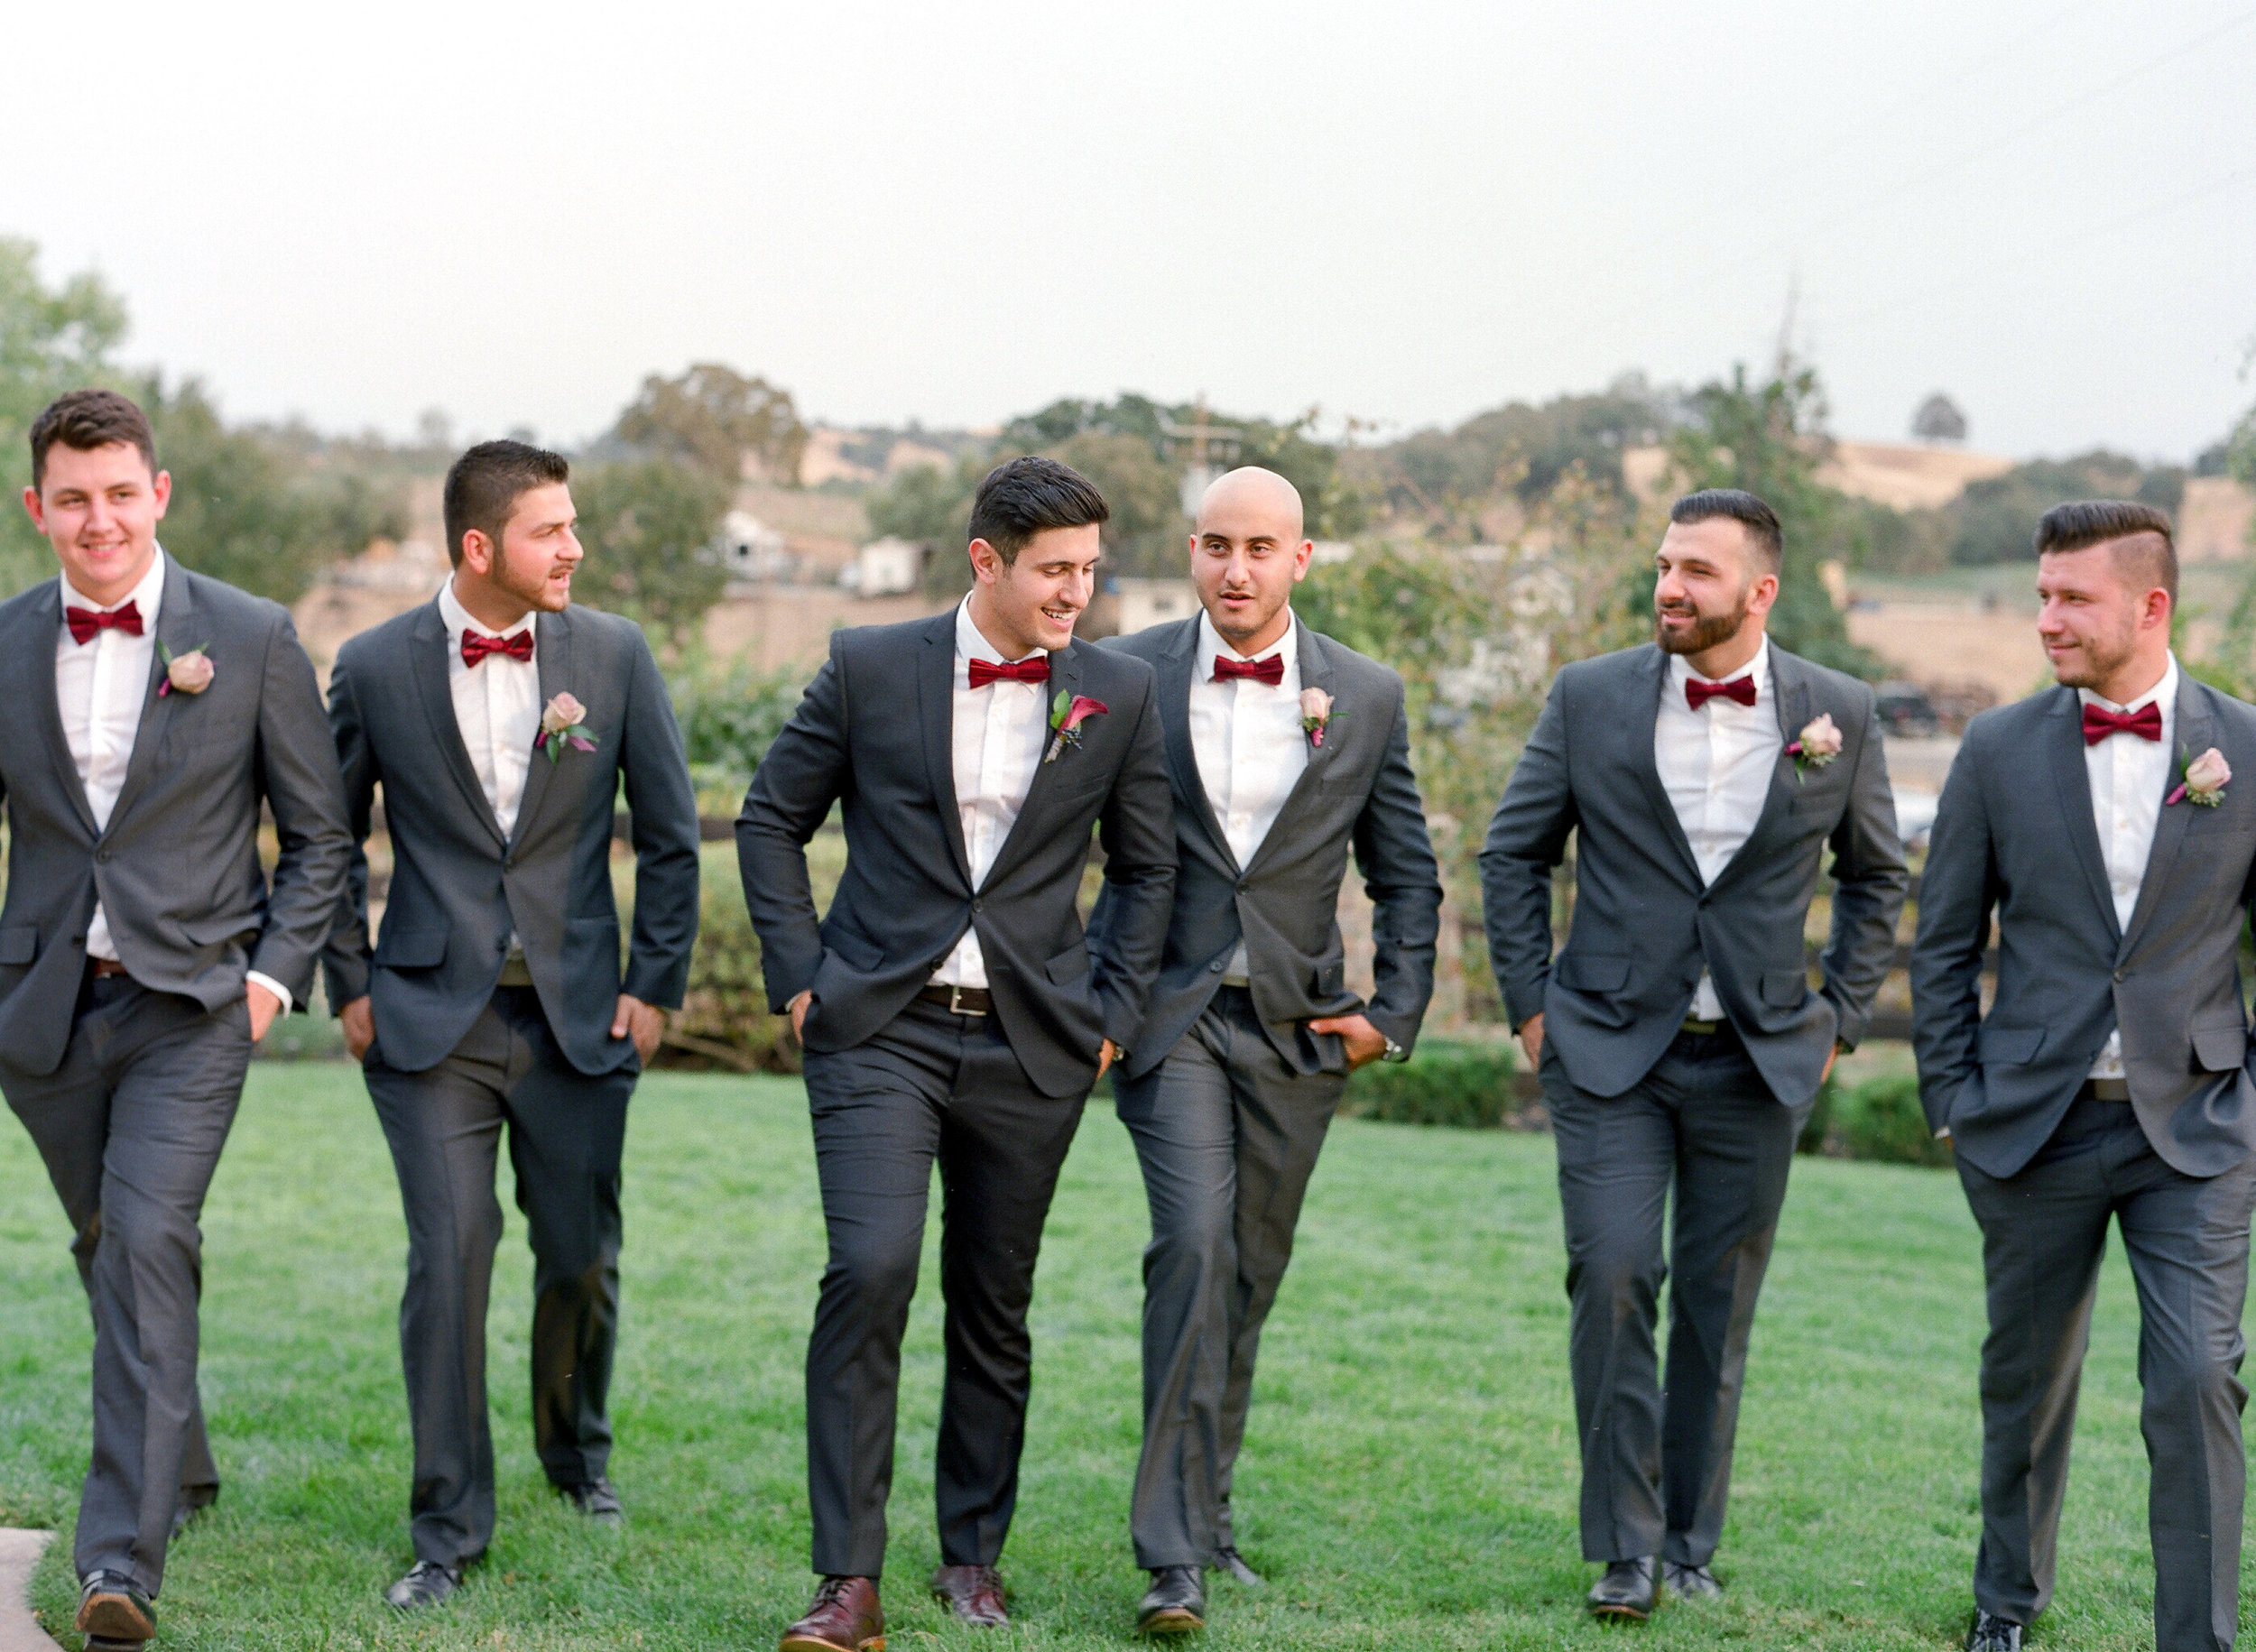 Amador_County_Wedding_Groom_Groomsmen_Walking_Posing_Rancho_Victoria_Vineyard_Northern_California.jpg